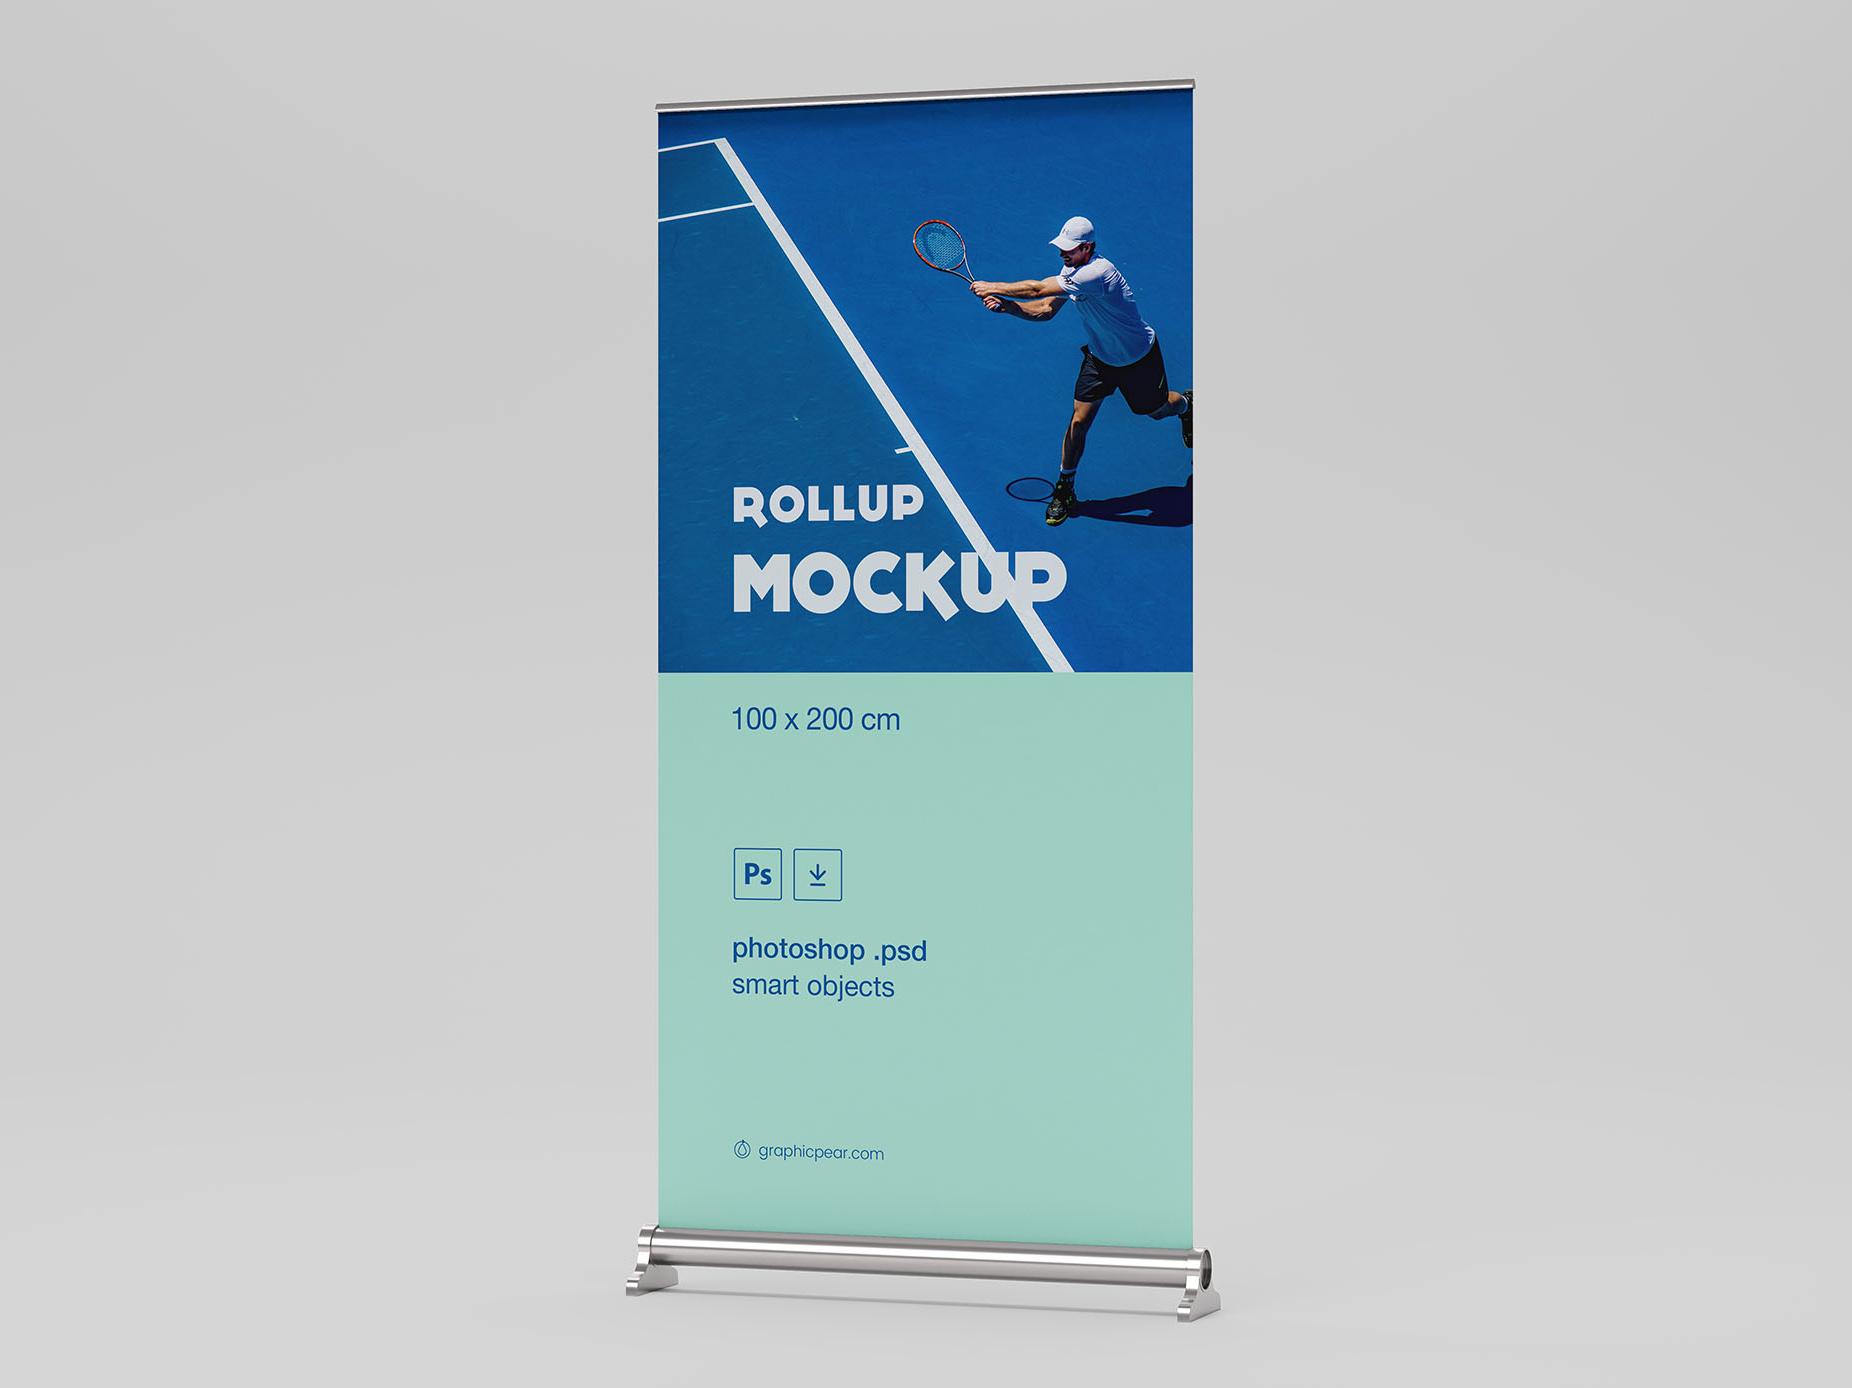 Rollup mockup  100 x 200